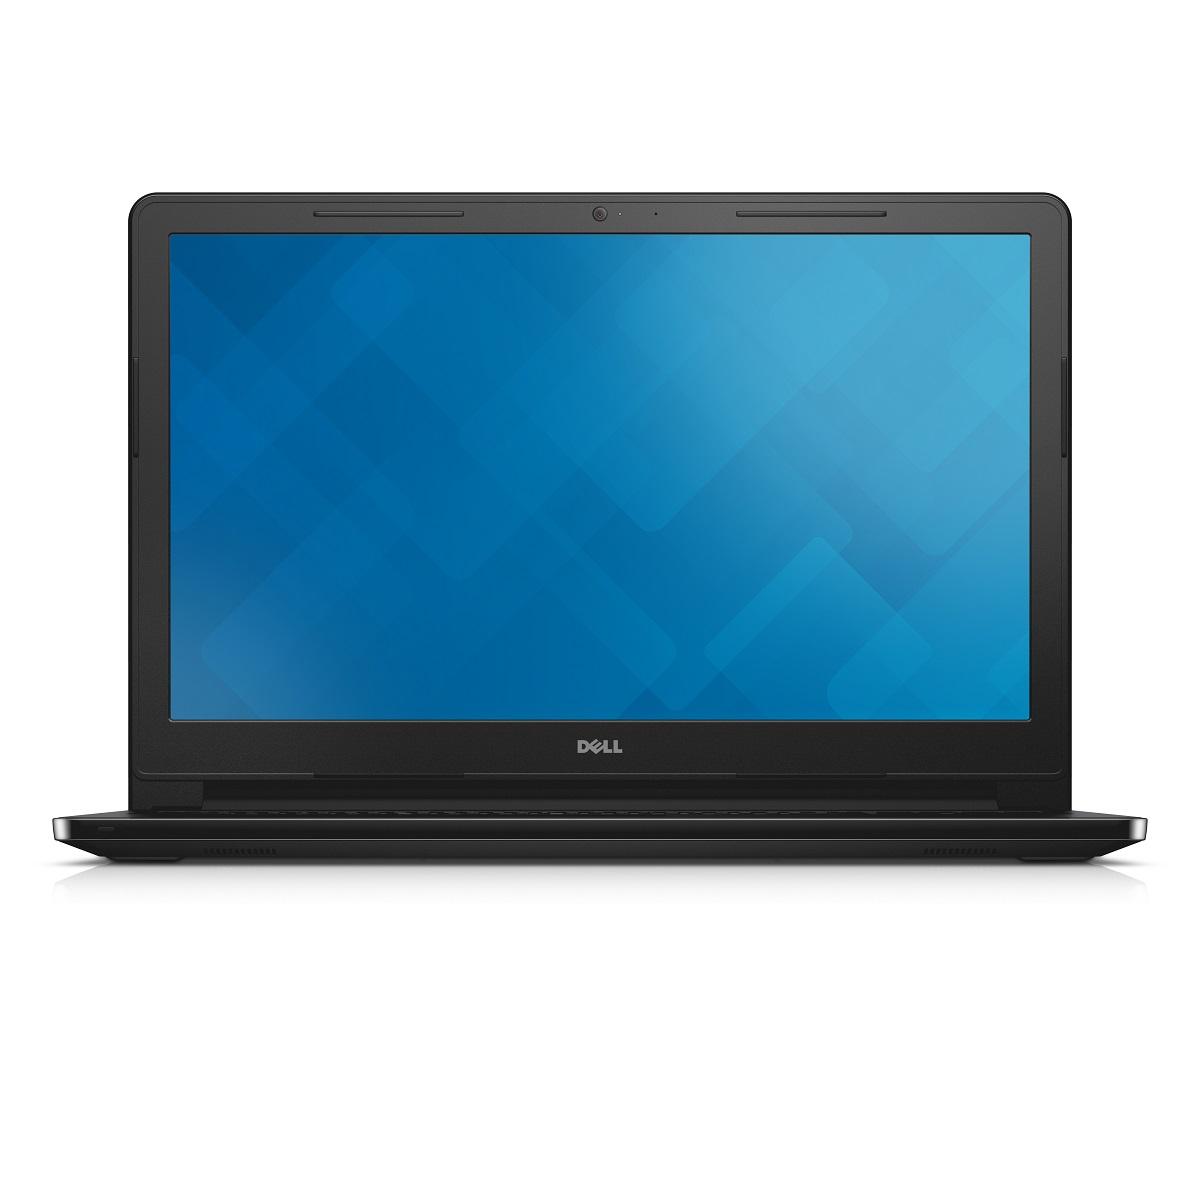 Notebook Dell Inspiron 3567 15.6 Full HD Intel Core i3-6006U RAM 4GB SSD 256GB Windows 10 Home